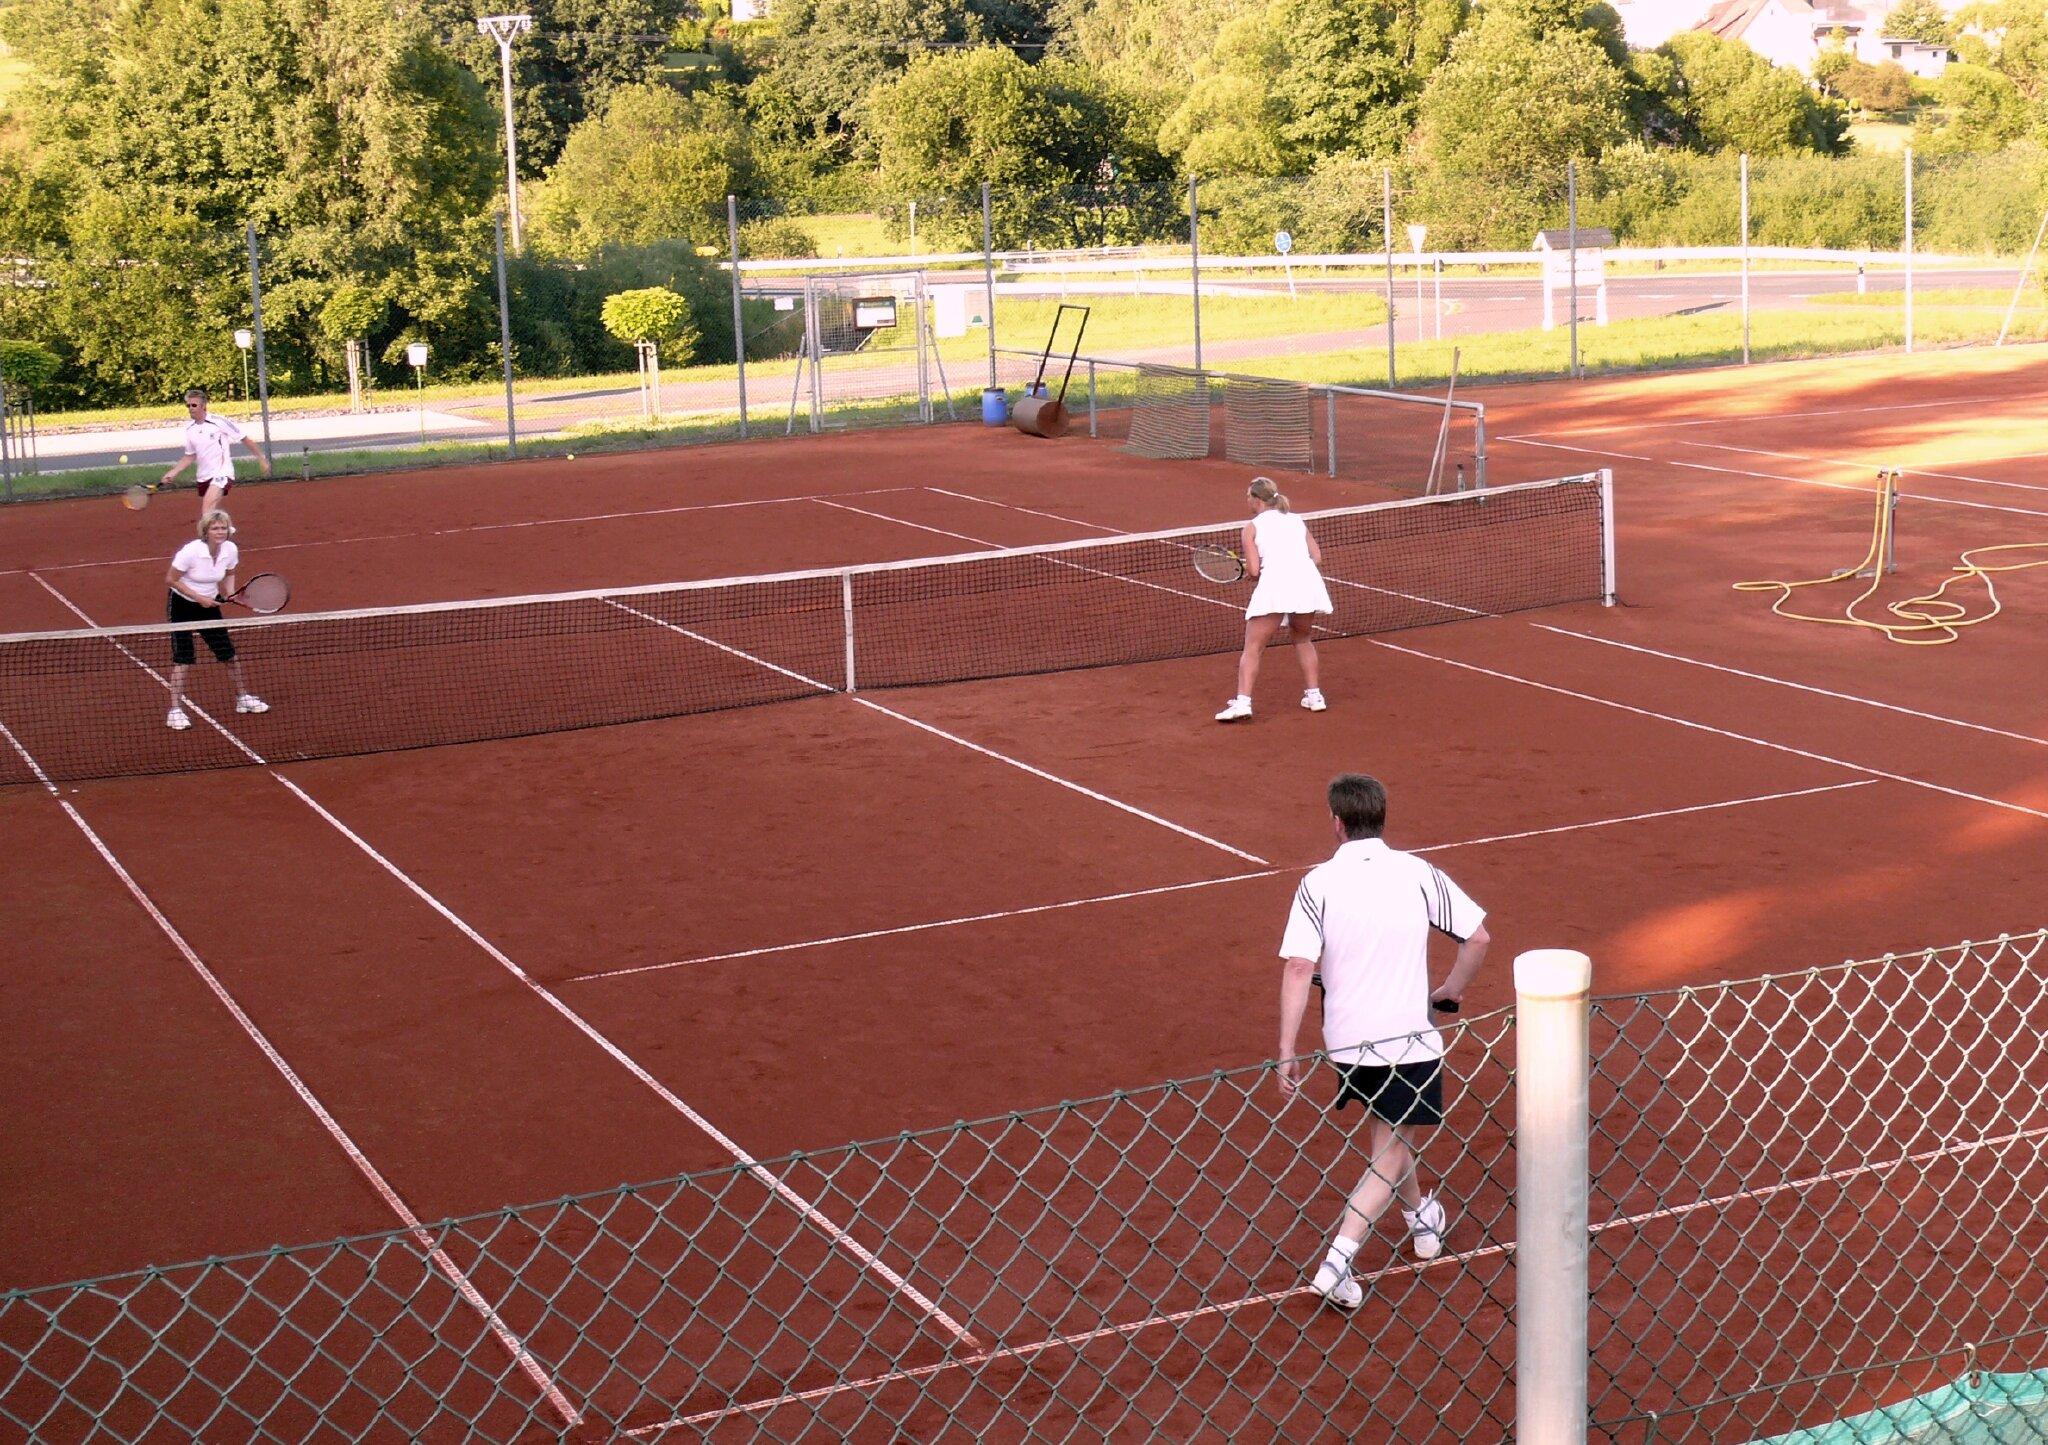 2 Tennisplätze ca. 100 m entfernt